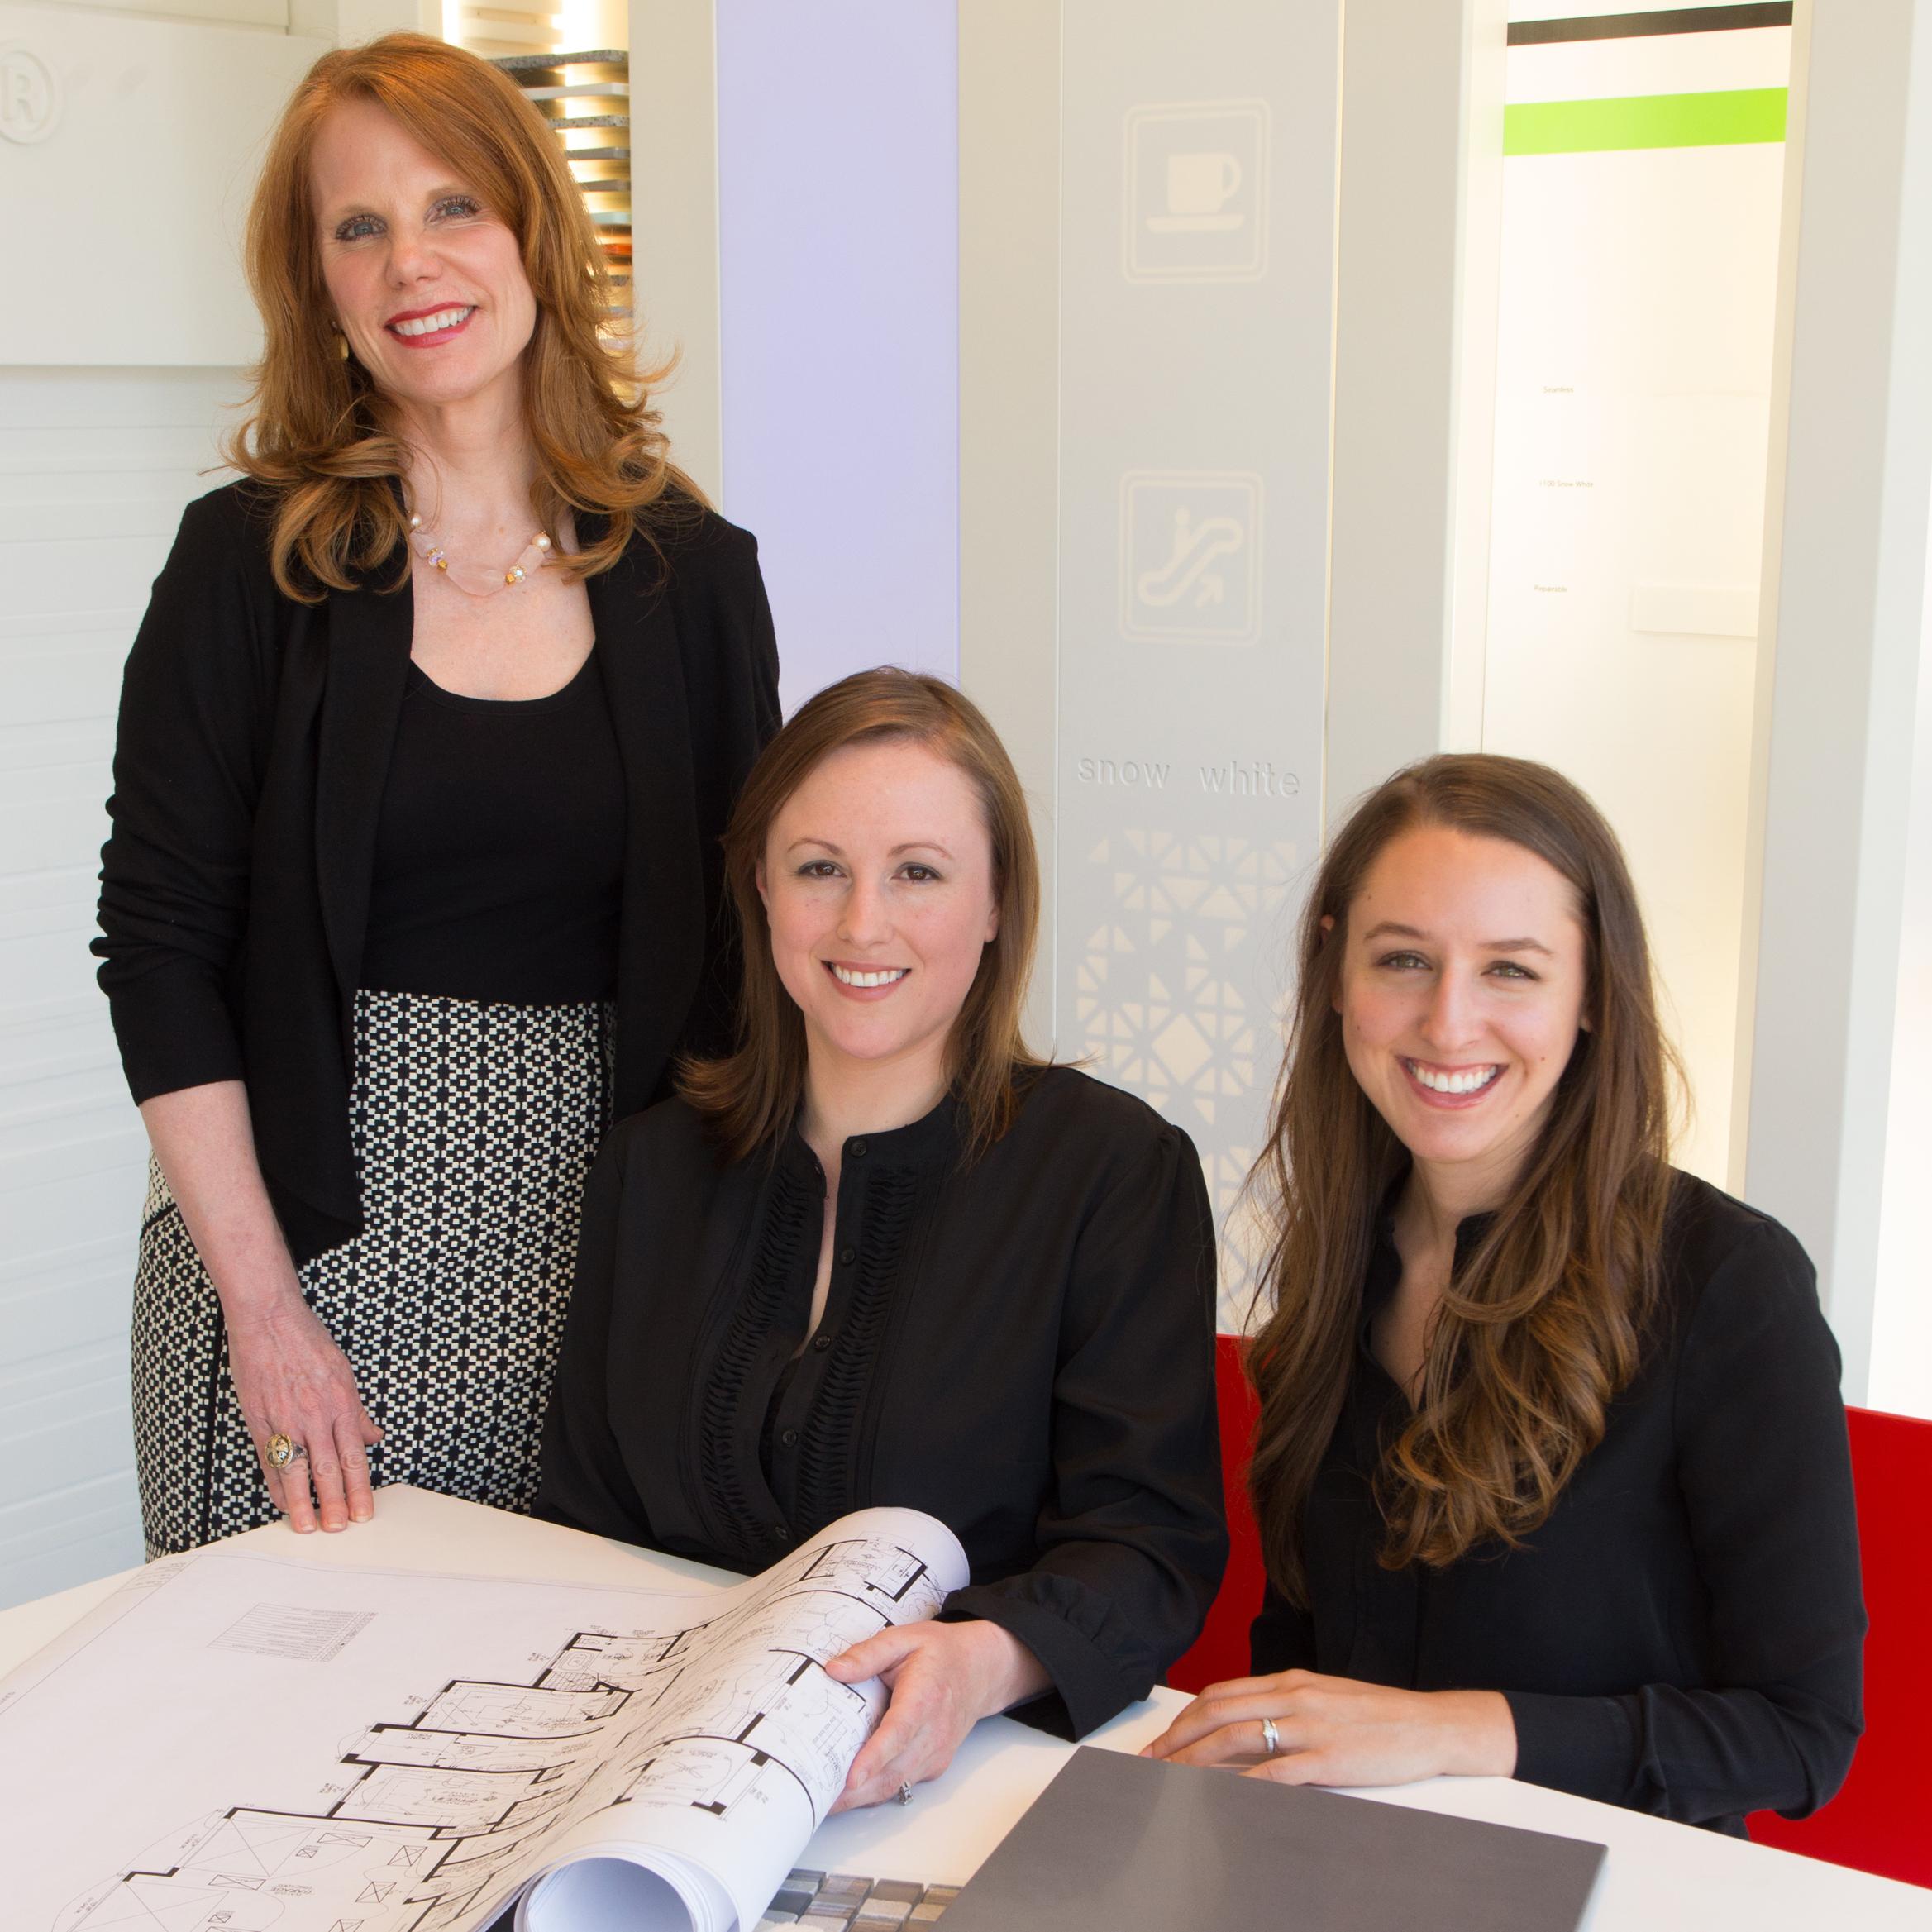 Alison Whittaker Design Team Services.jpg